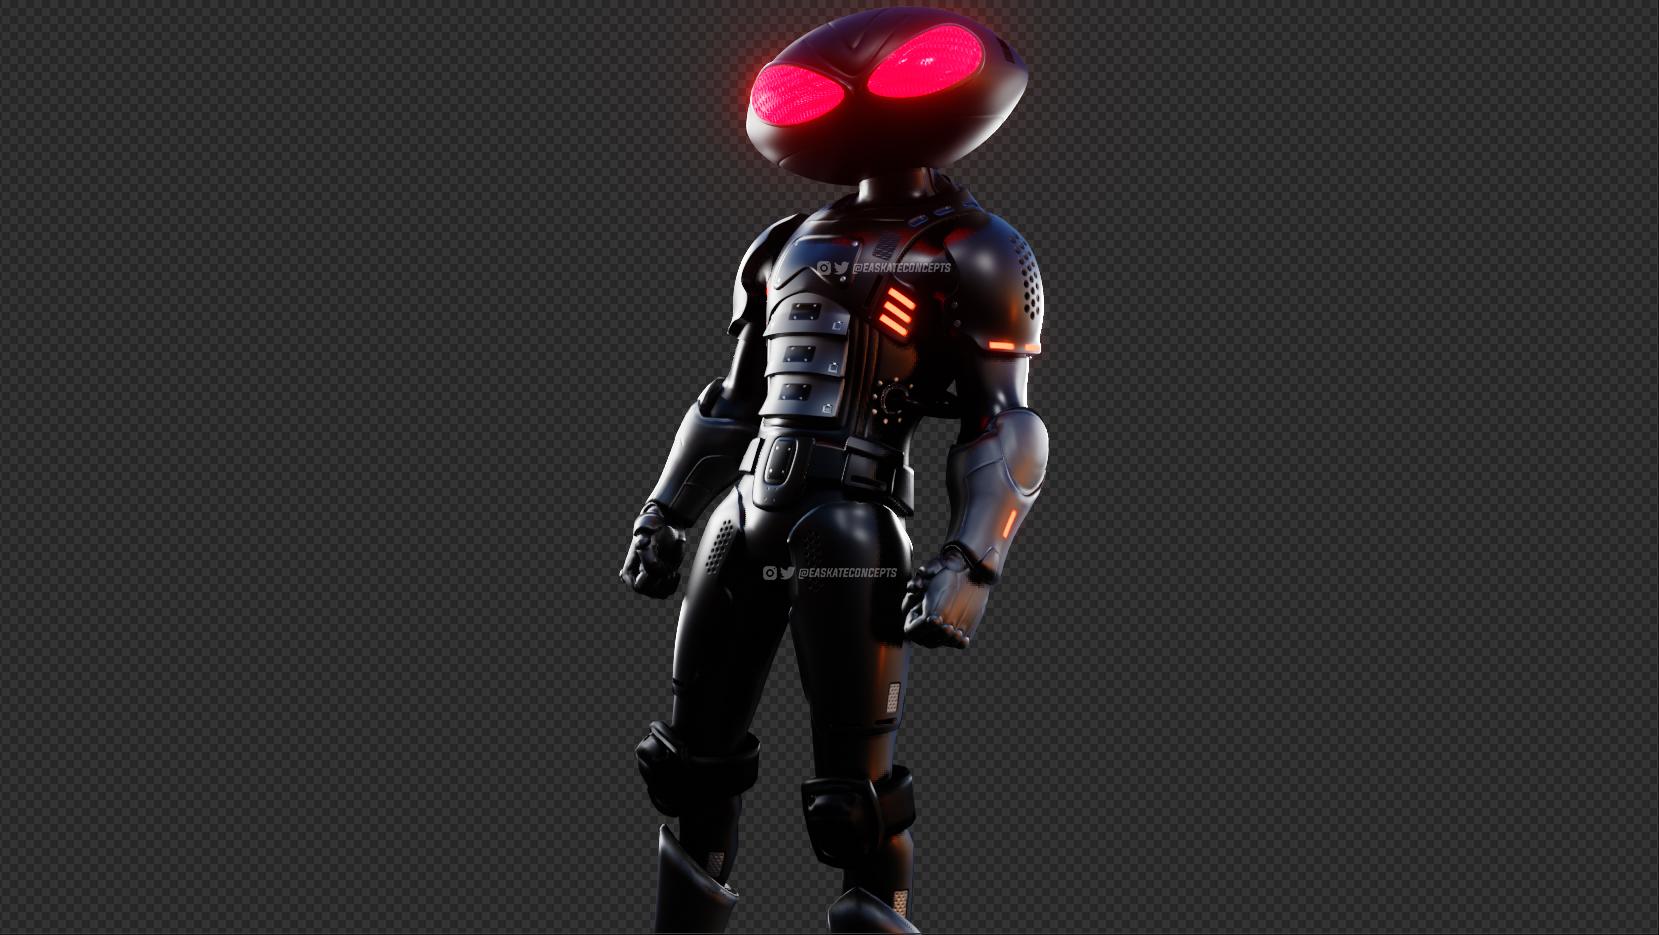 Fortnite Chapter 2 Season 3 leaked skin Black Manta